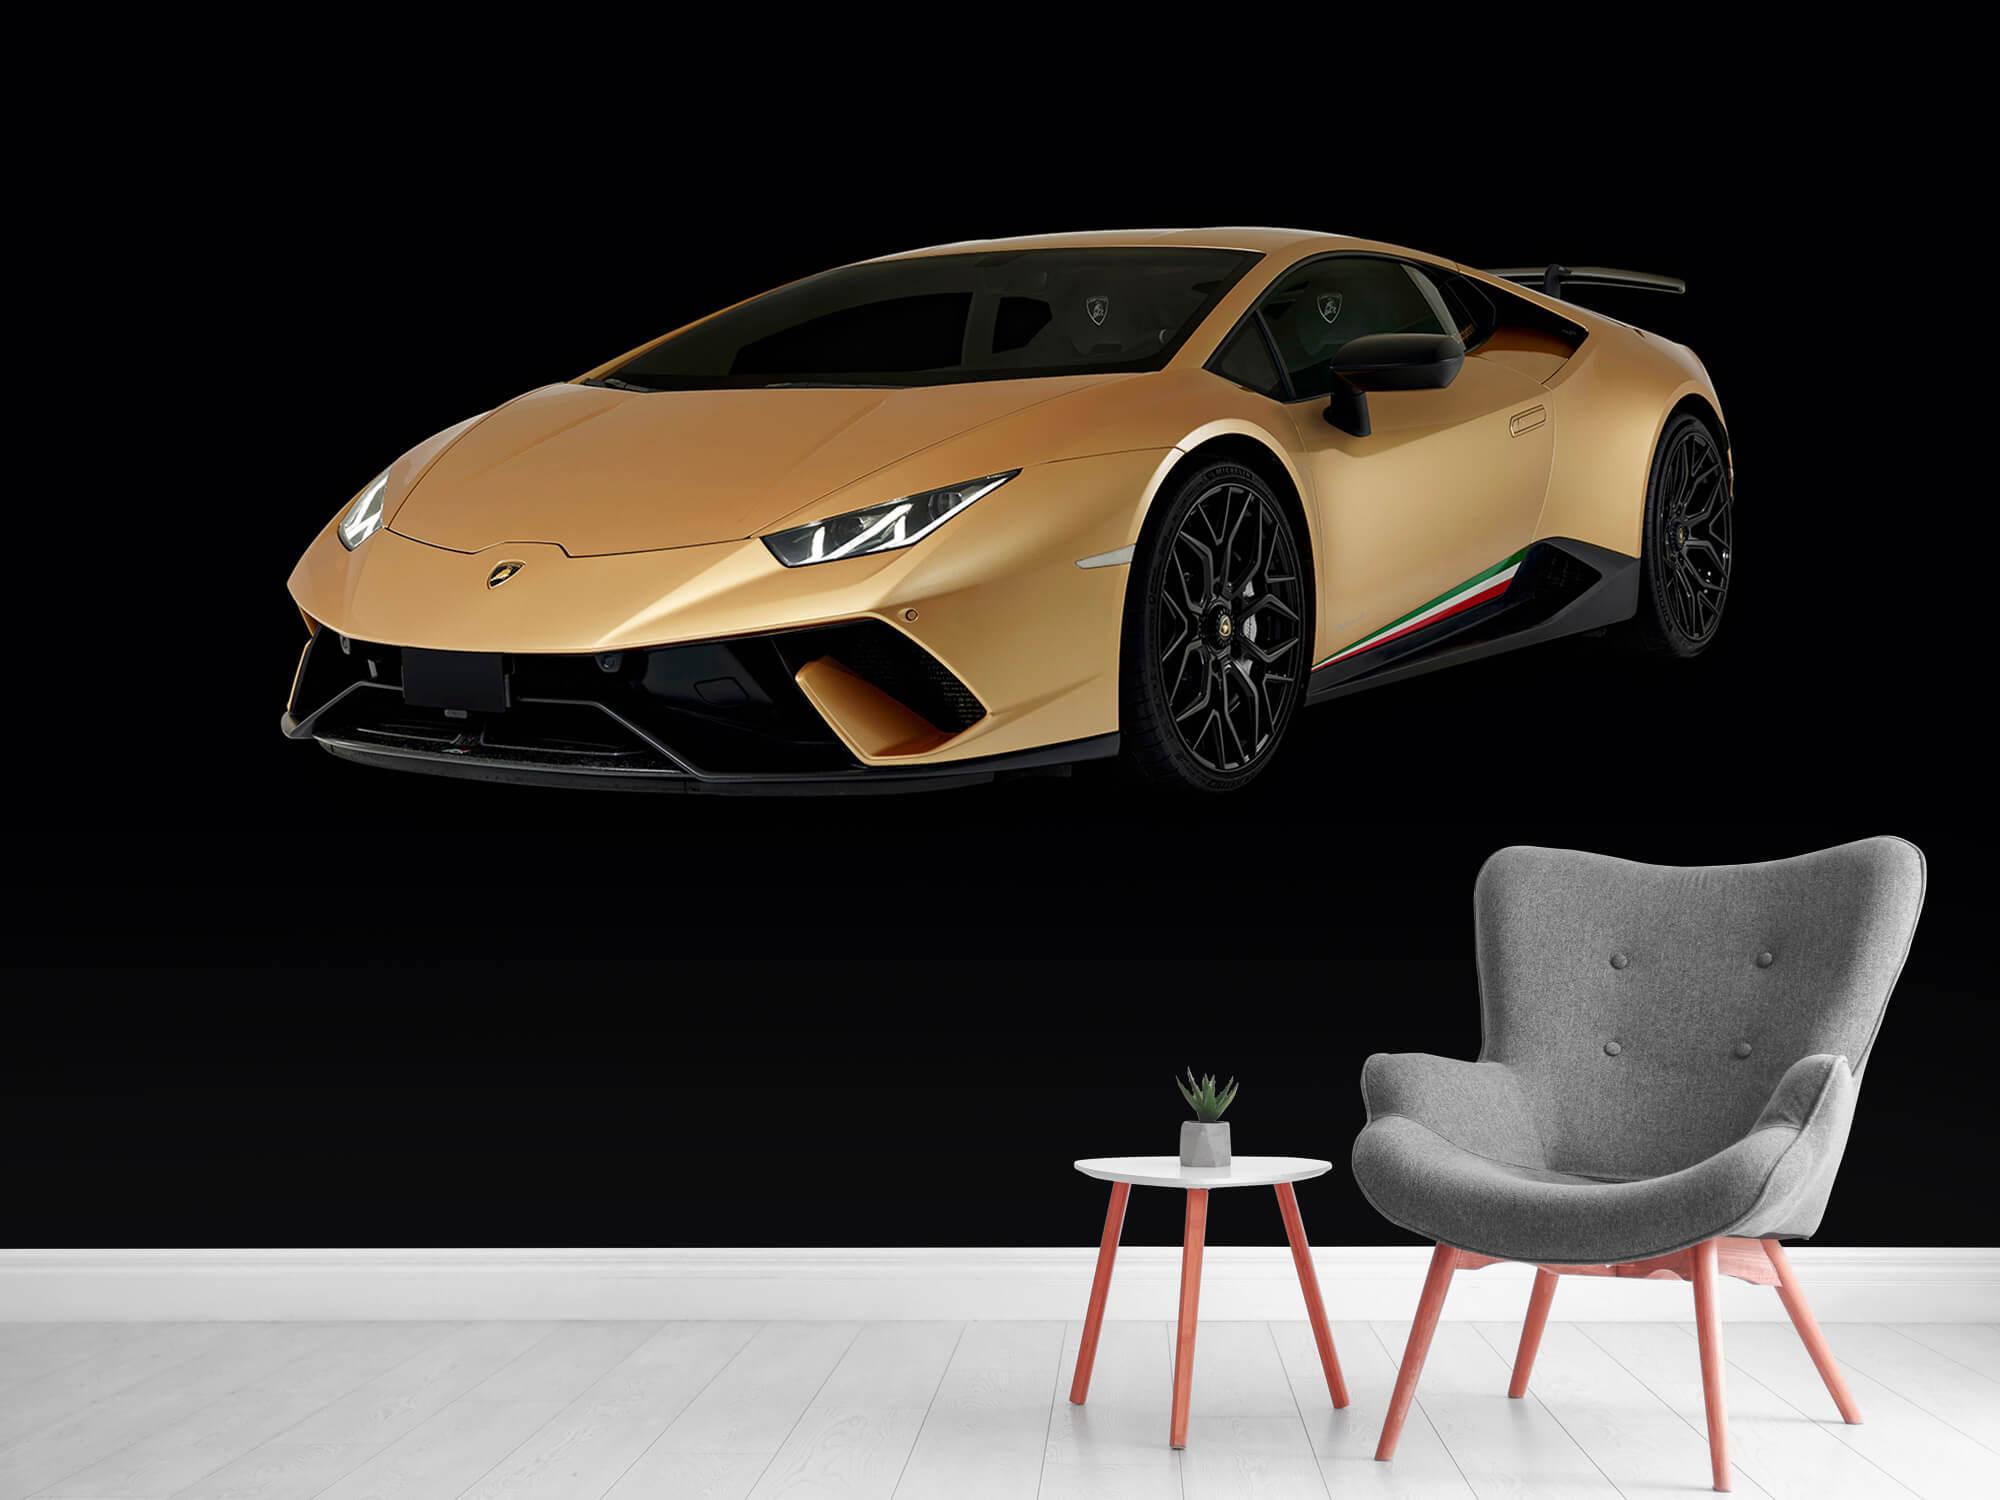 Wallpaper Lamborghini Huracán - Avant droit, noir 5